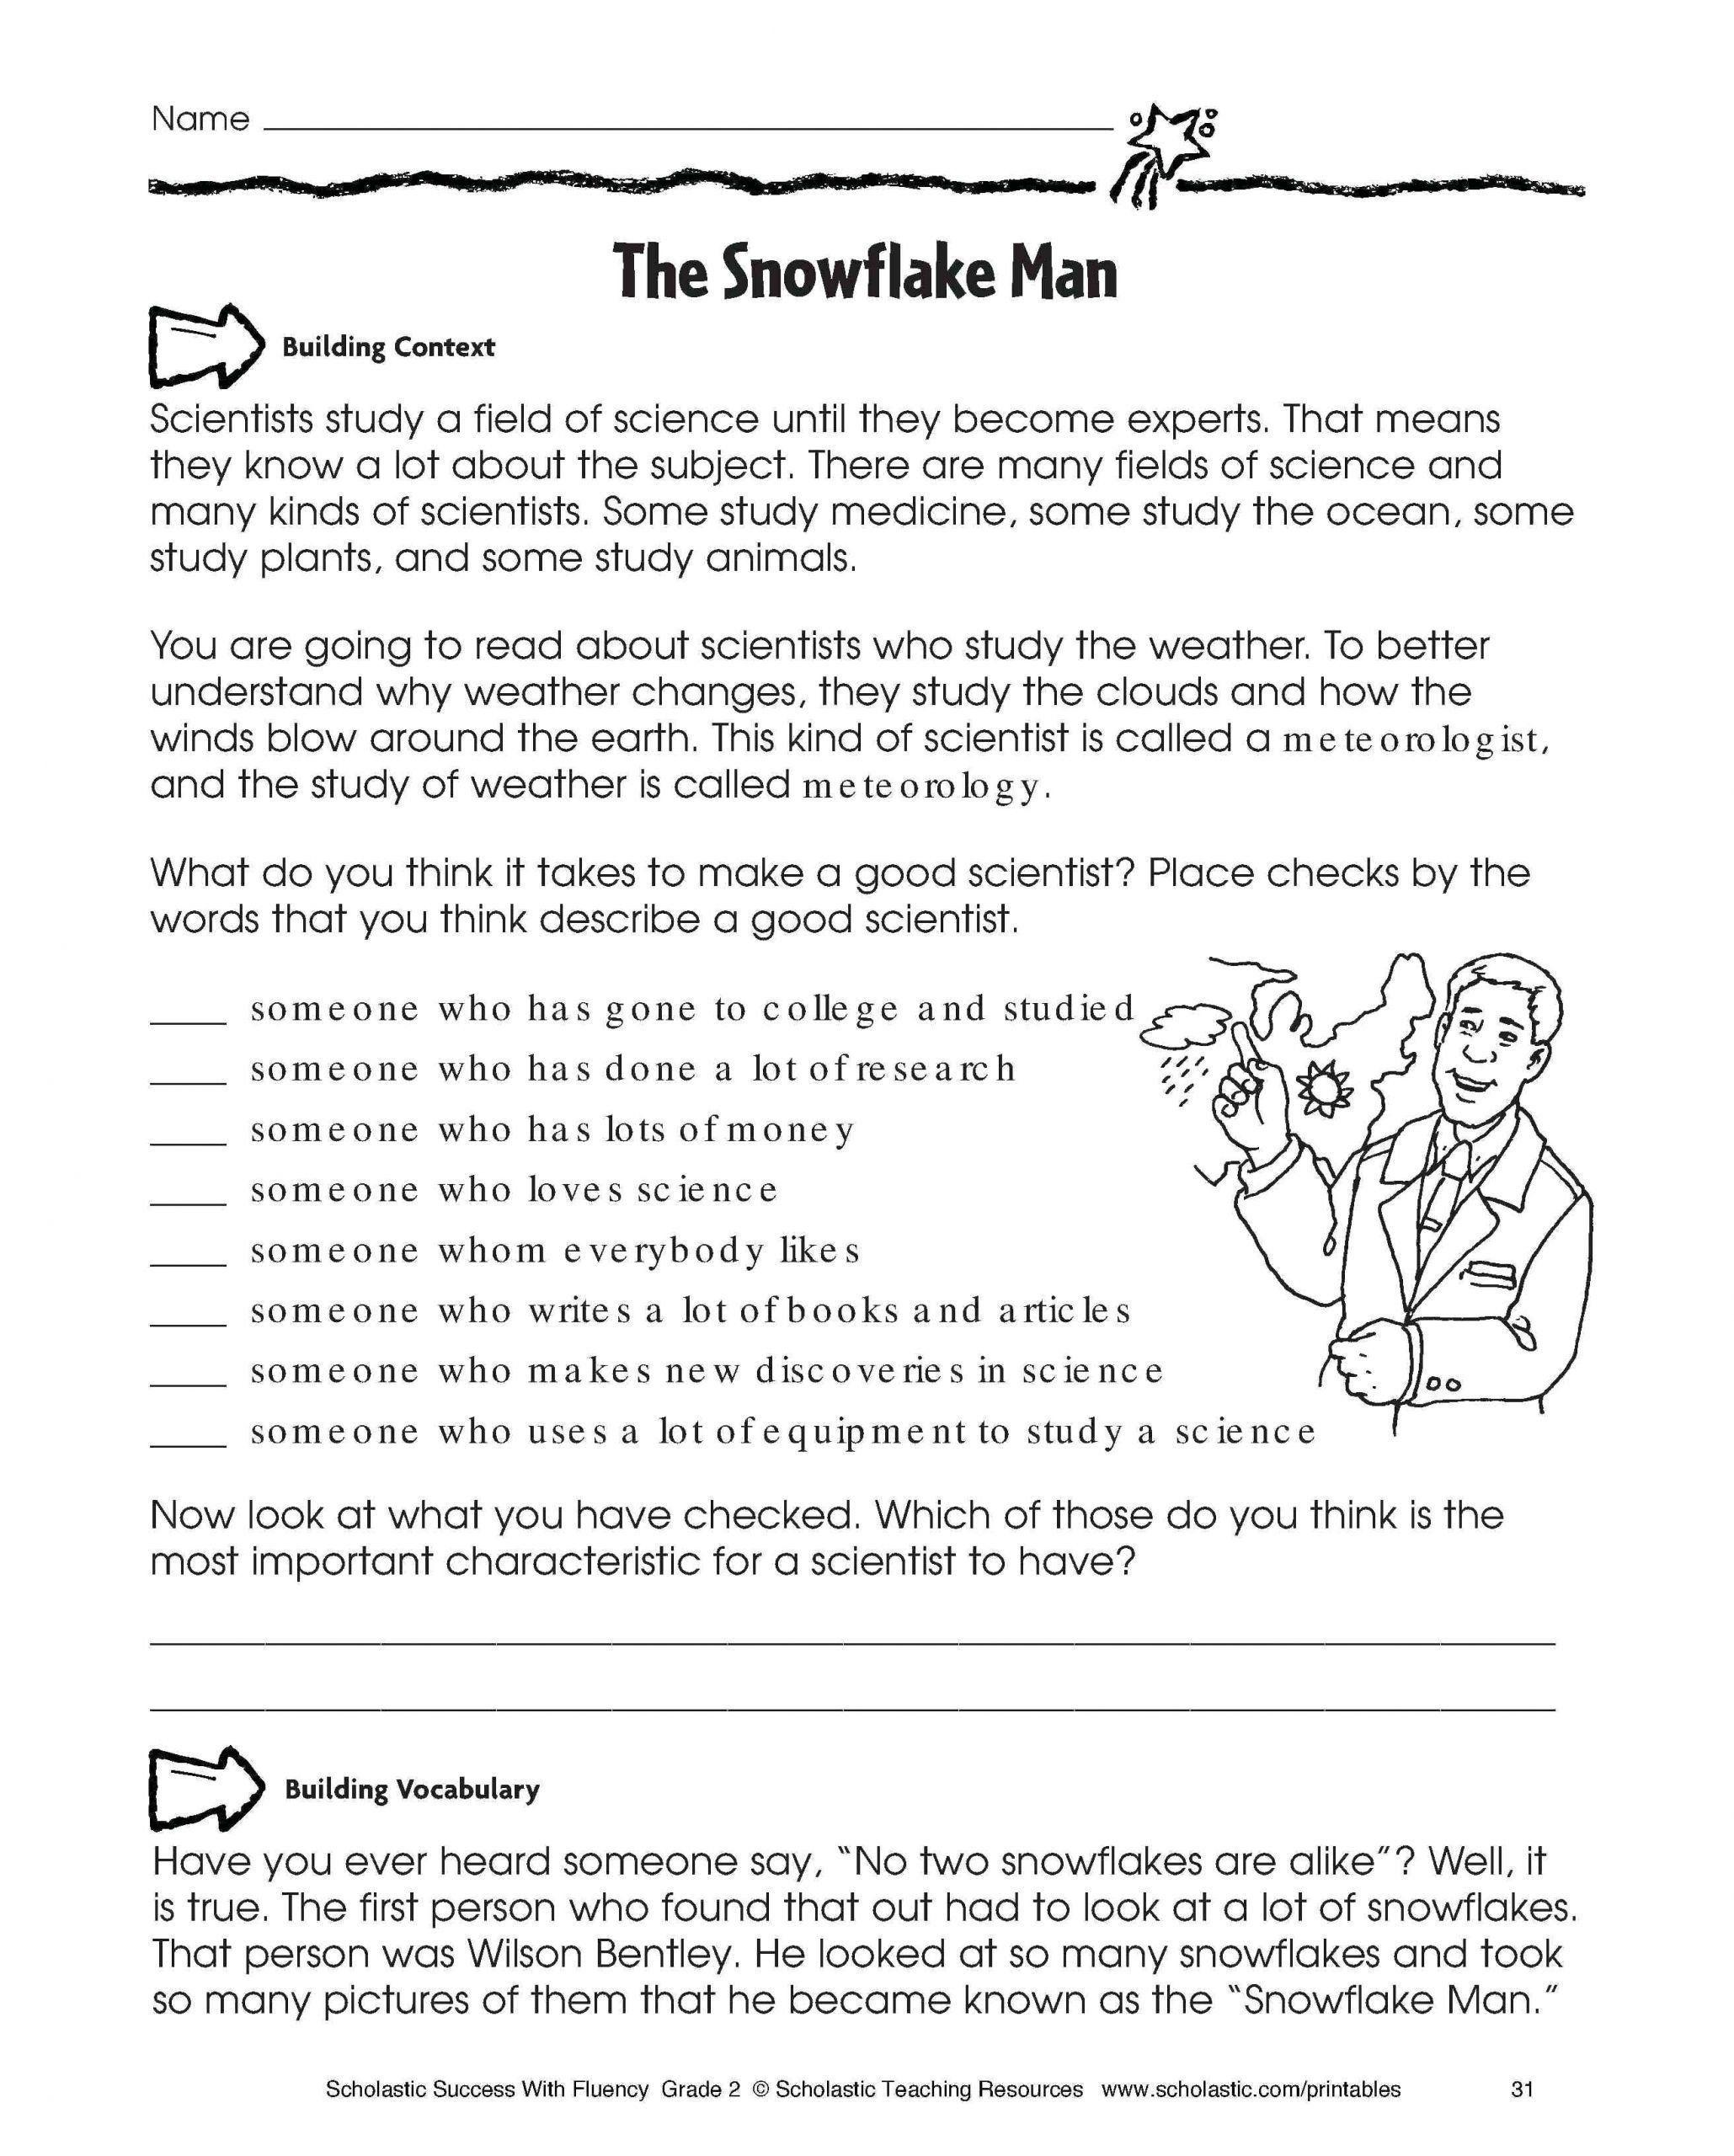 Poetry Worksheets For Middle School 5 Sample Grade 5 Reading Prehension 5th Grade In 2020 Comprehension Worksheets Reading Comprehension Worksheets Reading Worksheets [ 2560 x 2059 Pixel ]